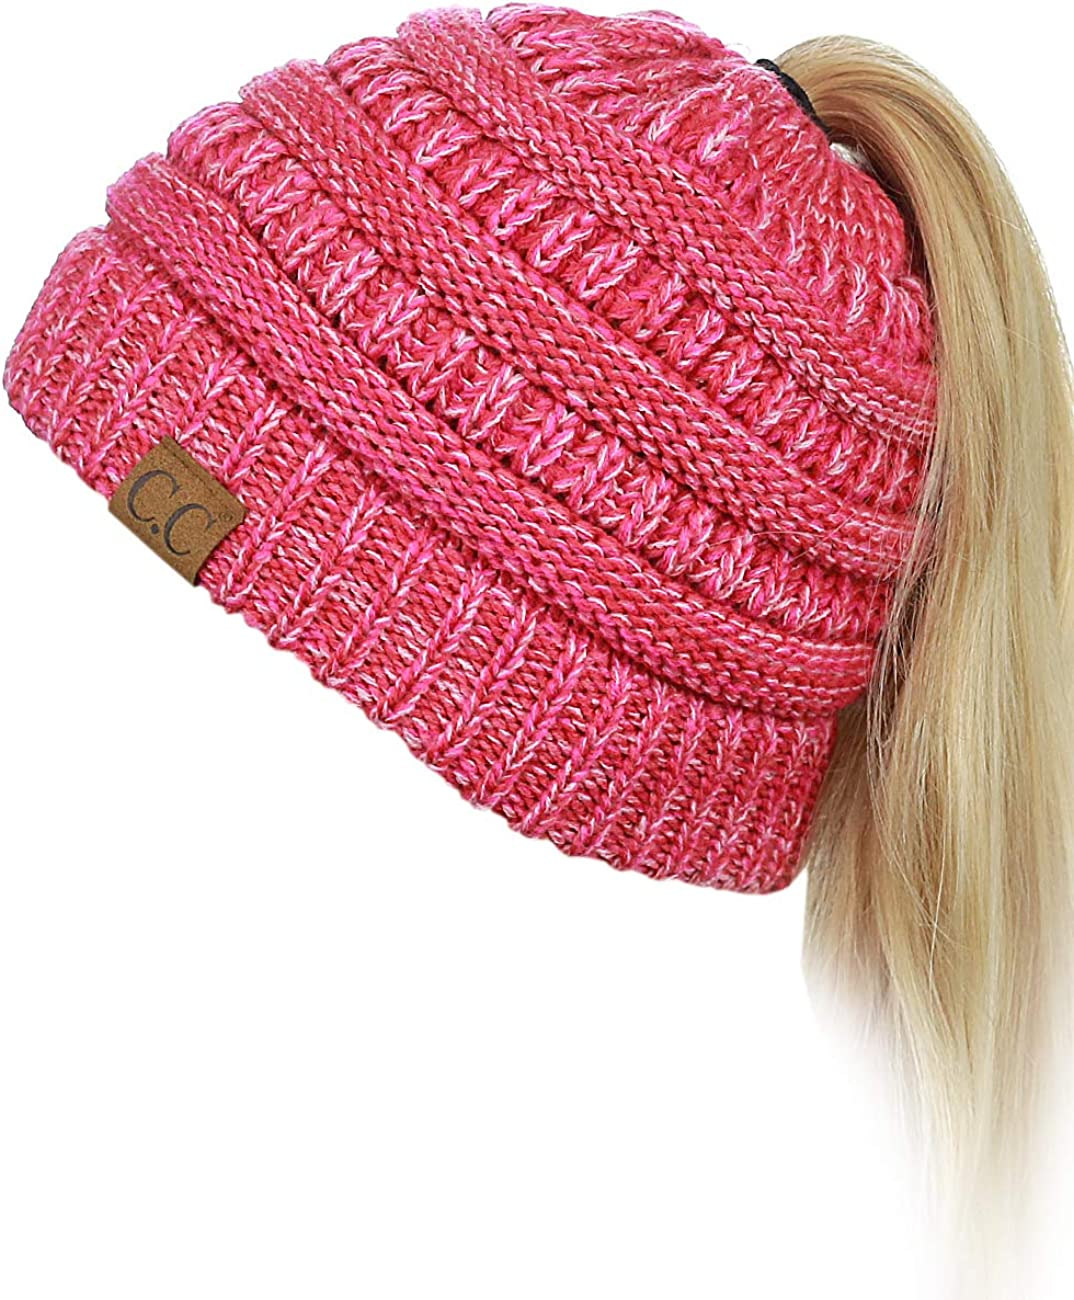 Messy Bun Winter Hat